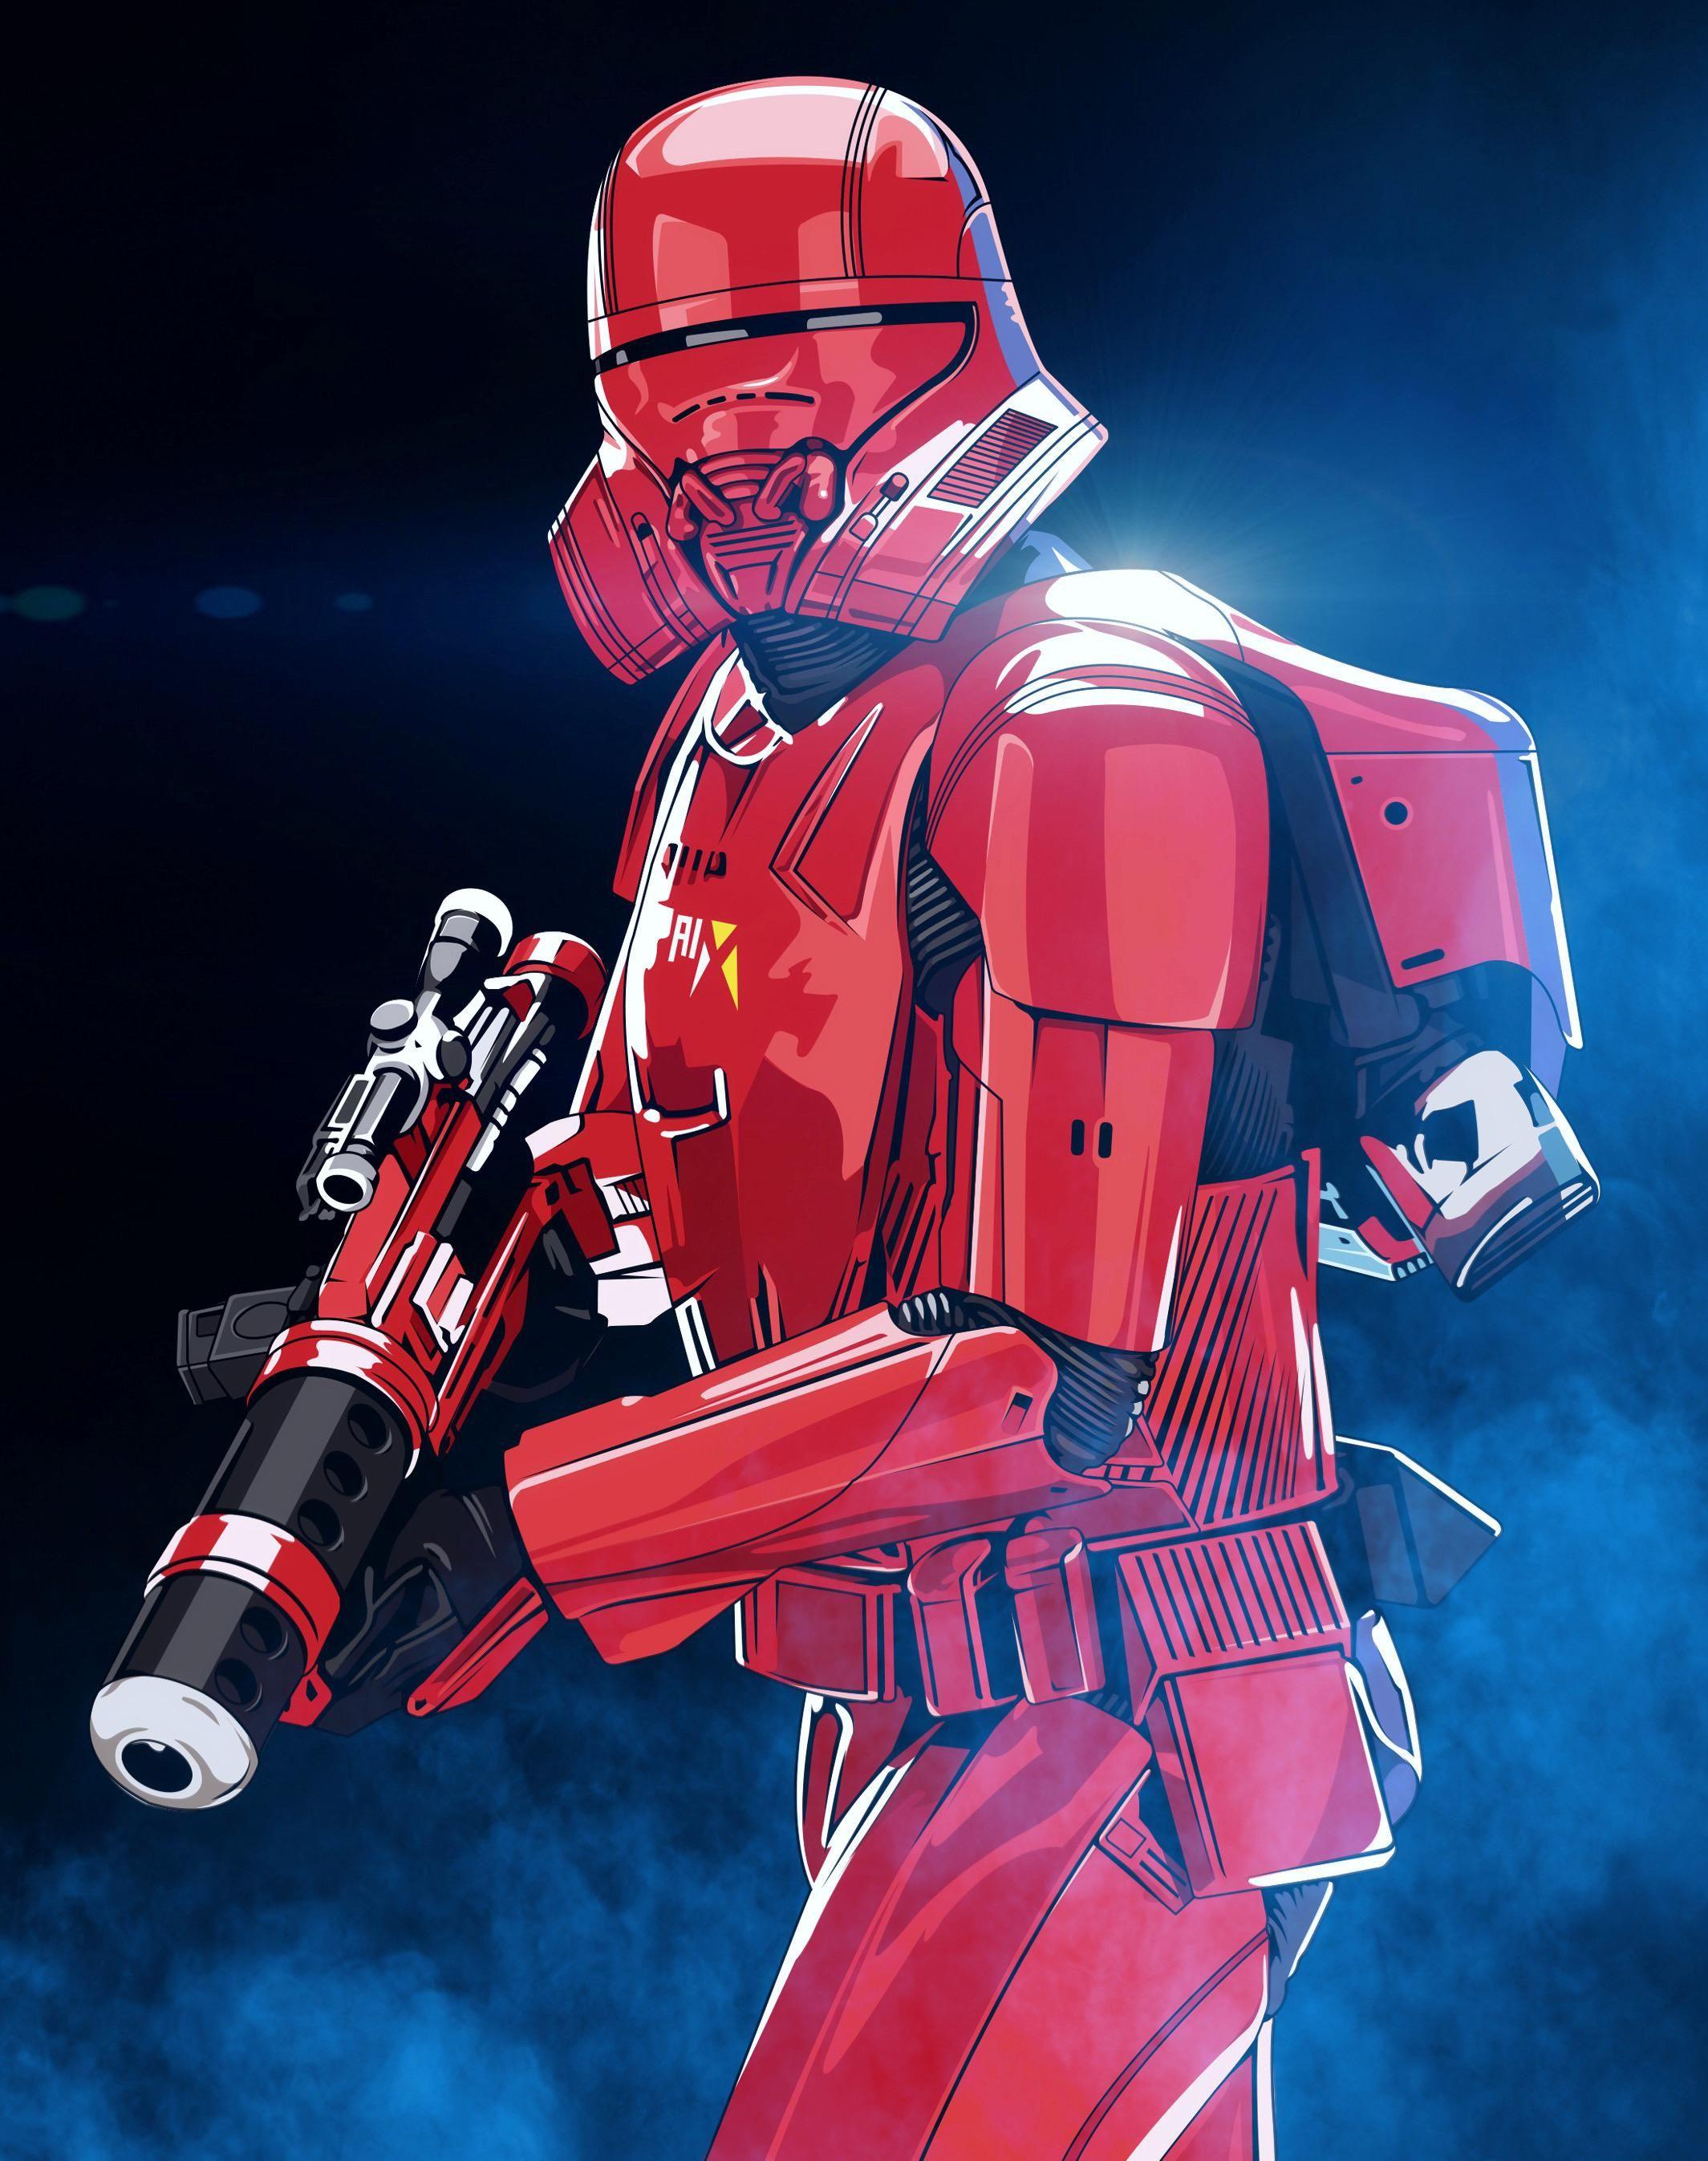 Just Finished Some Sith Jet Trooper Vector Art Hope You Like Https Ift Tt 32v0muy Star Wars Background Star Wars Wallpaper Star Wars Images